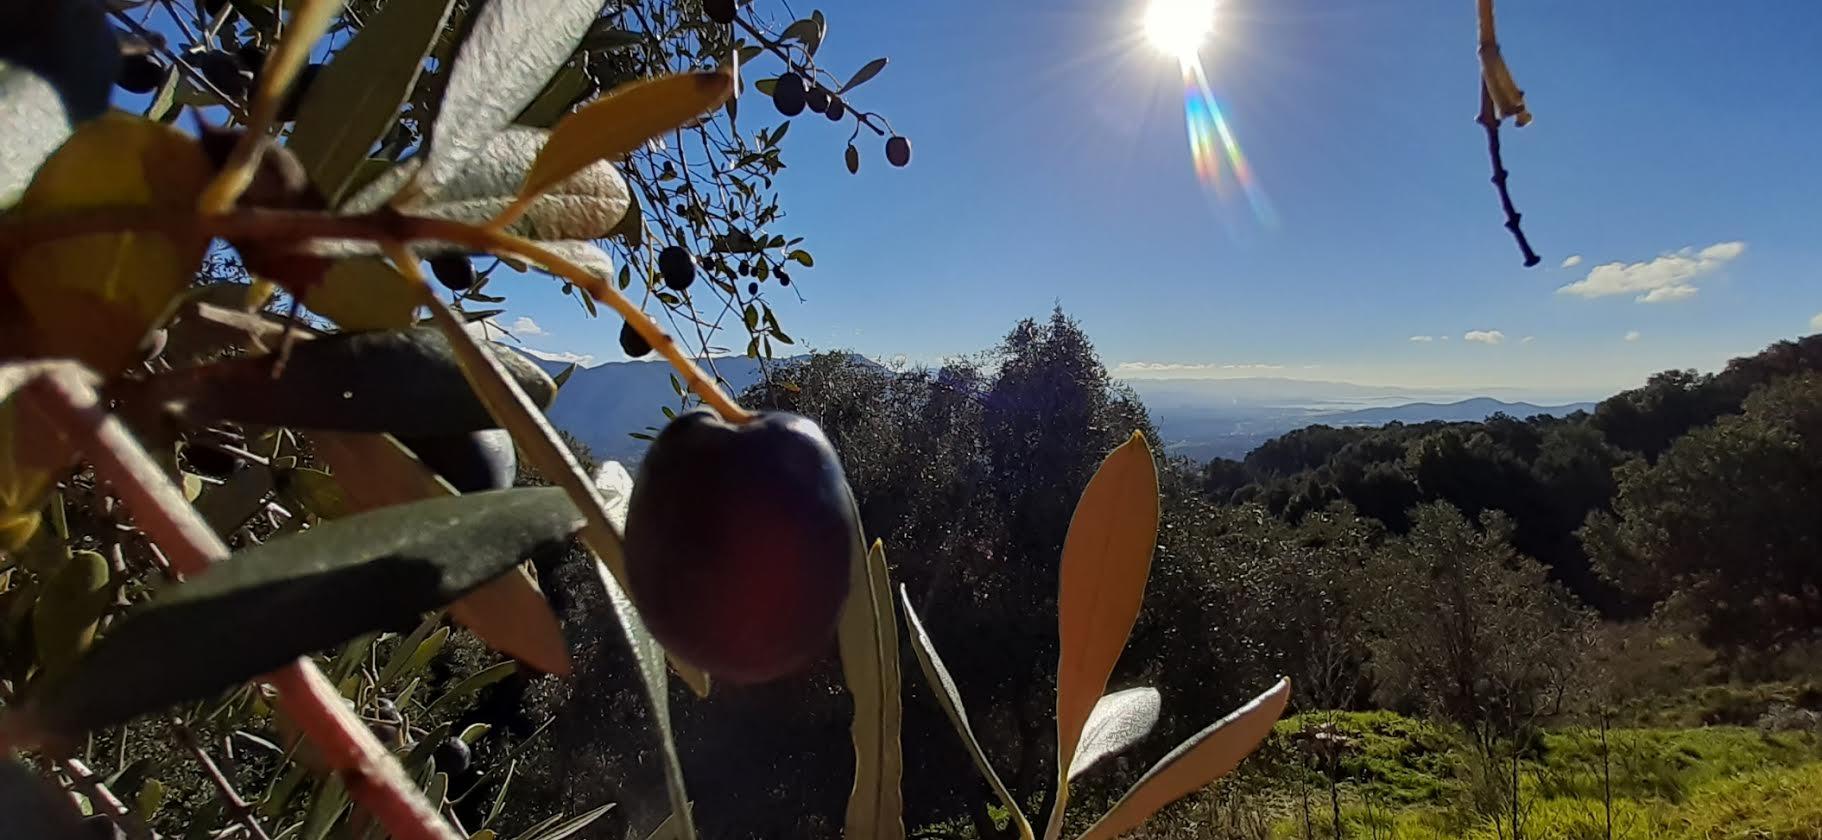 Sarrula Carcupinu...U sole, u mare e l aliva... (Nunzia-Maria Vesperini-Lugrezi )